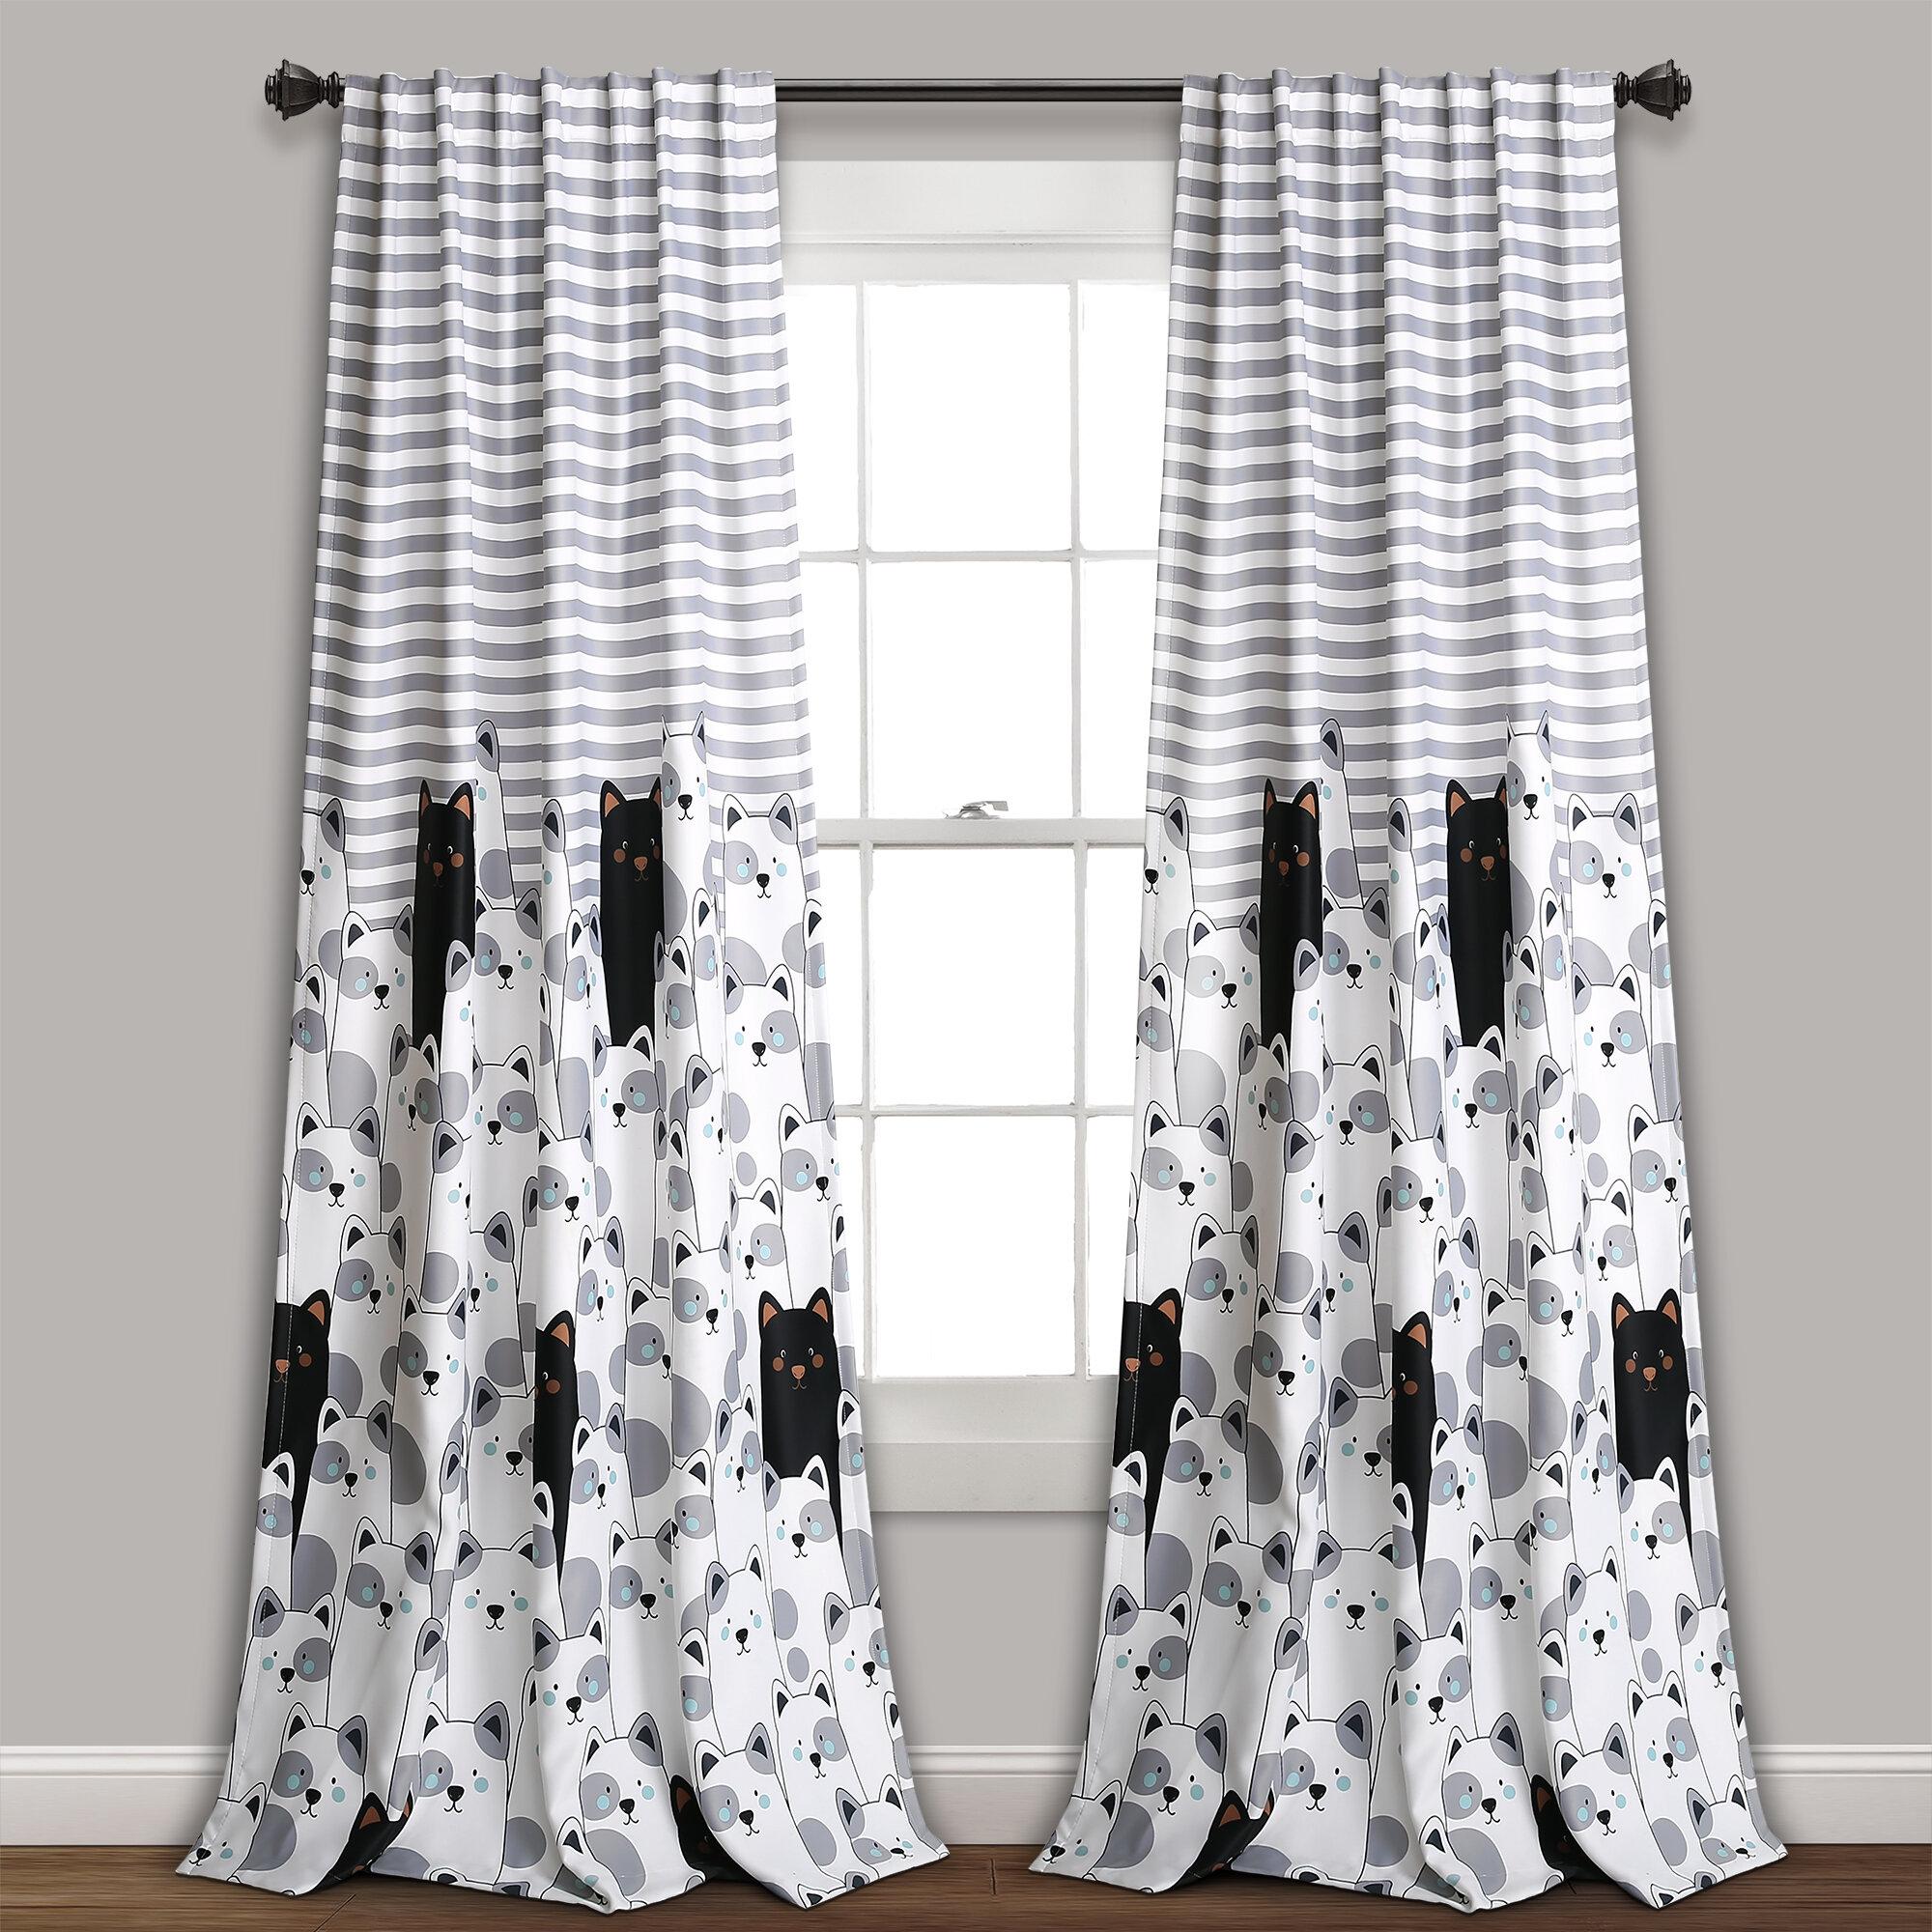 Zoomie Kids Ann Window Striped Room Darkening Rod Pocket Curtain Panels Wayfair Ca